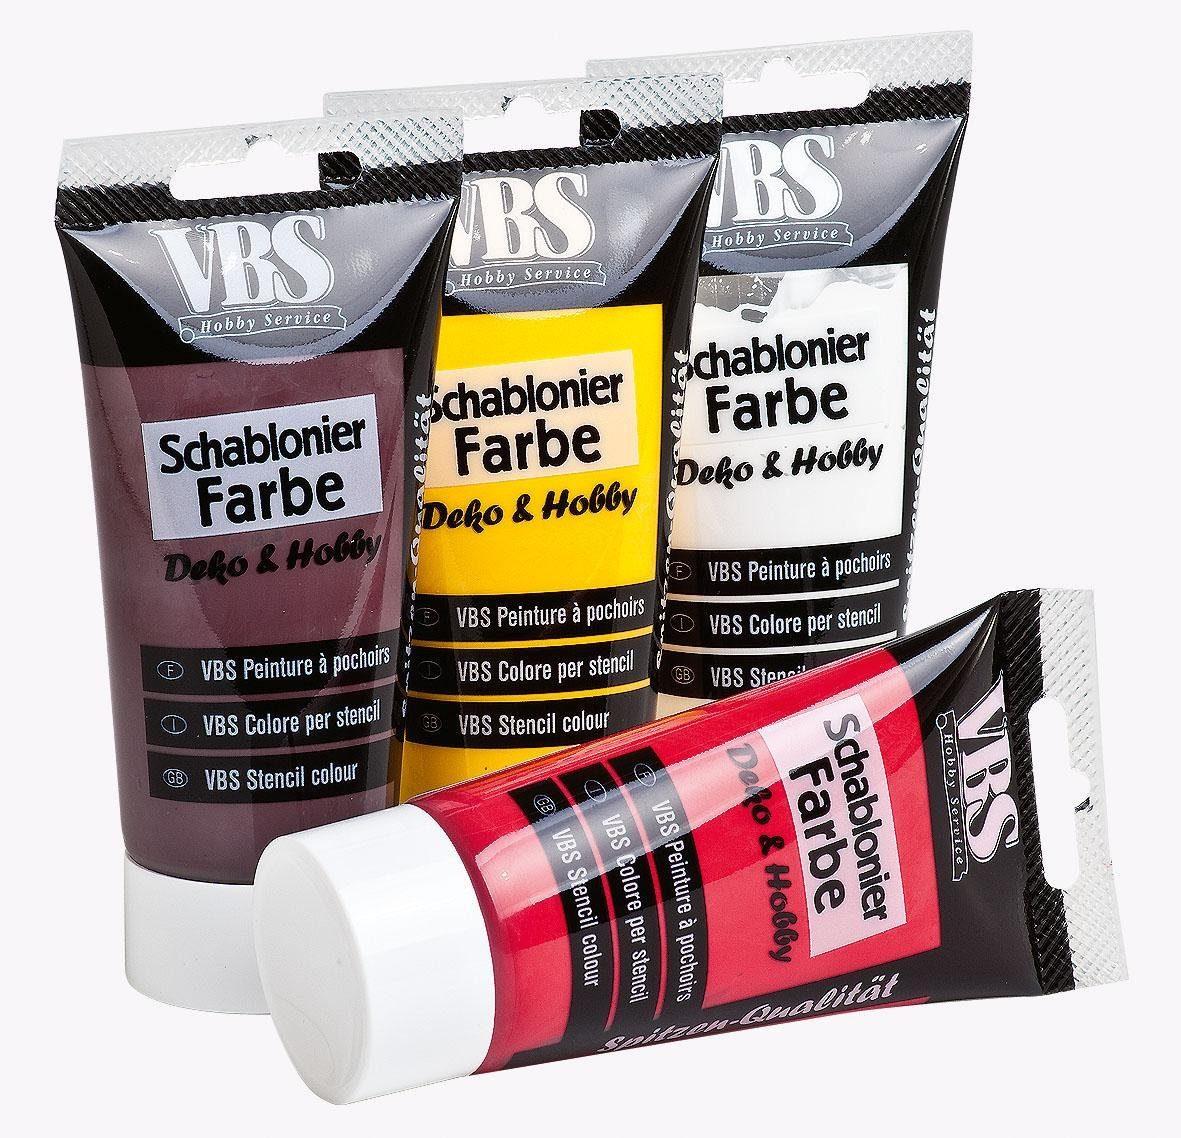 VBS Farbset Schablonierfarbe, 4er-Set